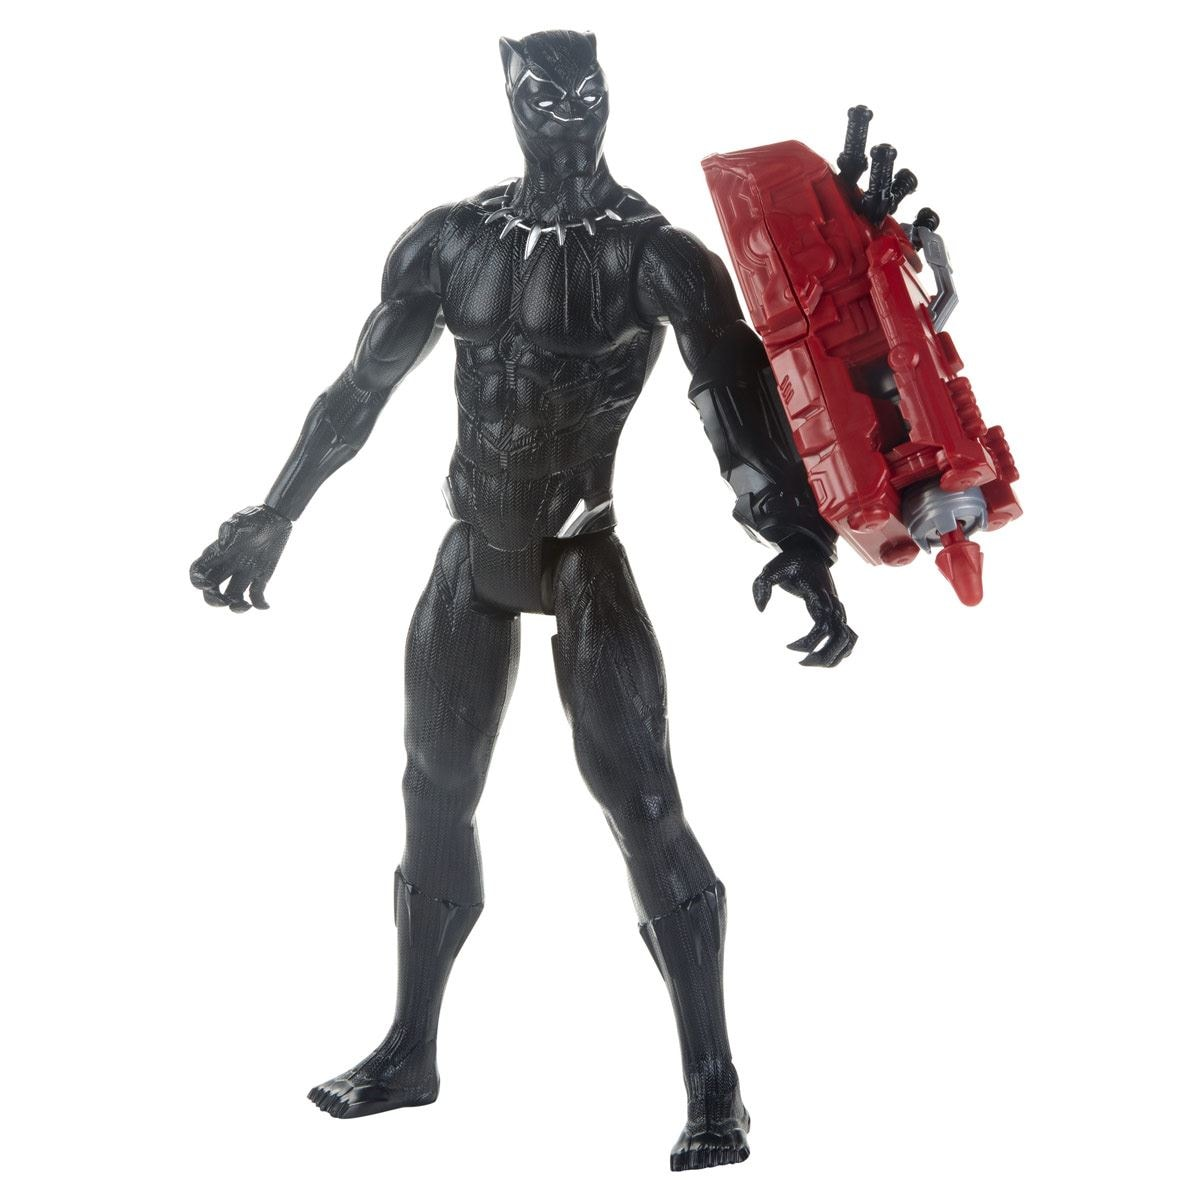 Marvel Avengers Titan Hero Series Movie Black Panther